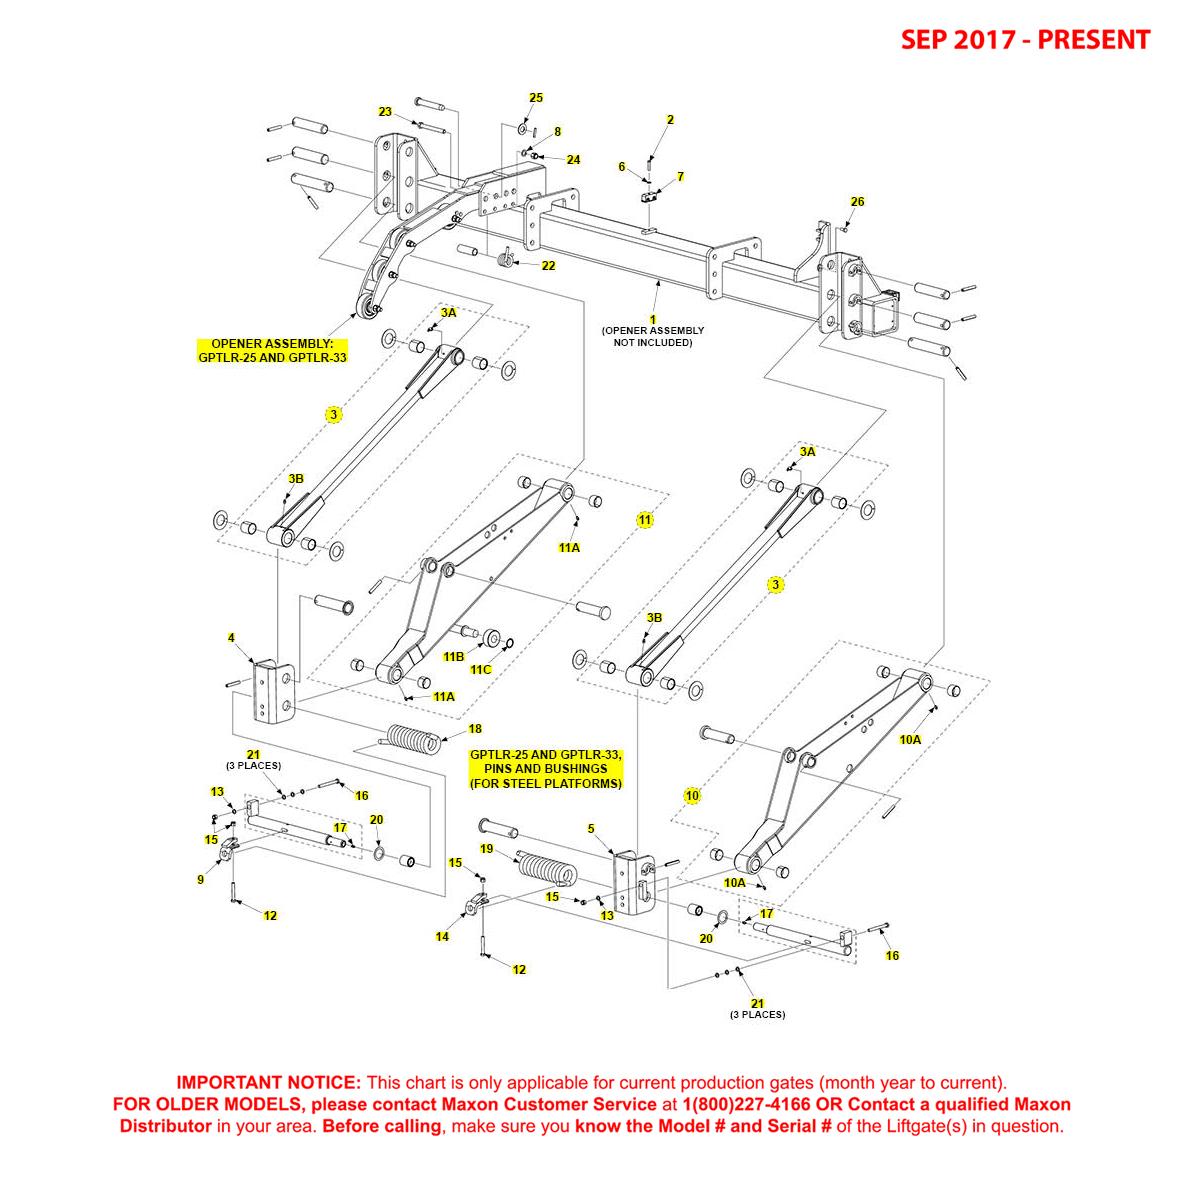 Maxon Gptlr33 Wiring Diagram